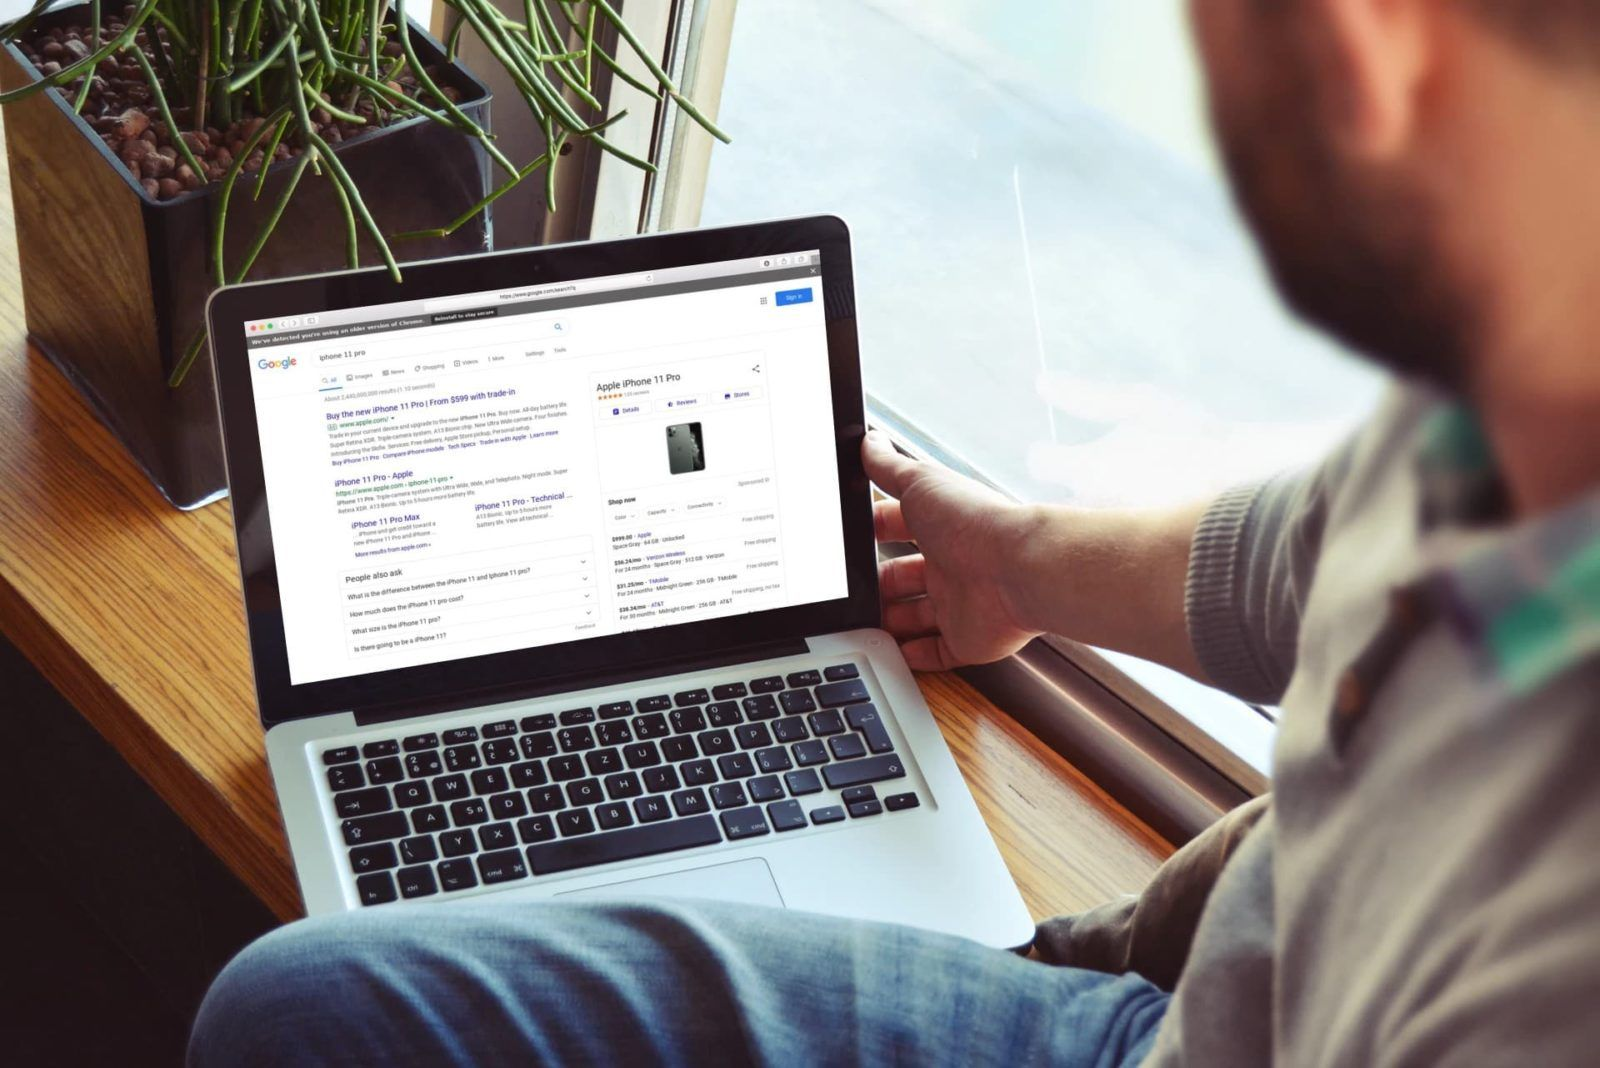 Recherche-google-macbook pro